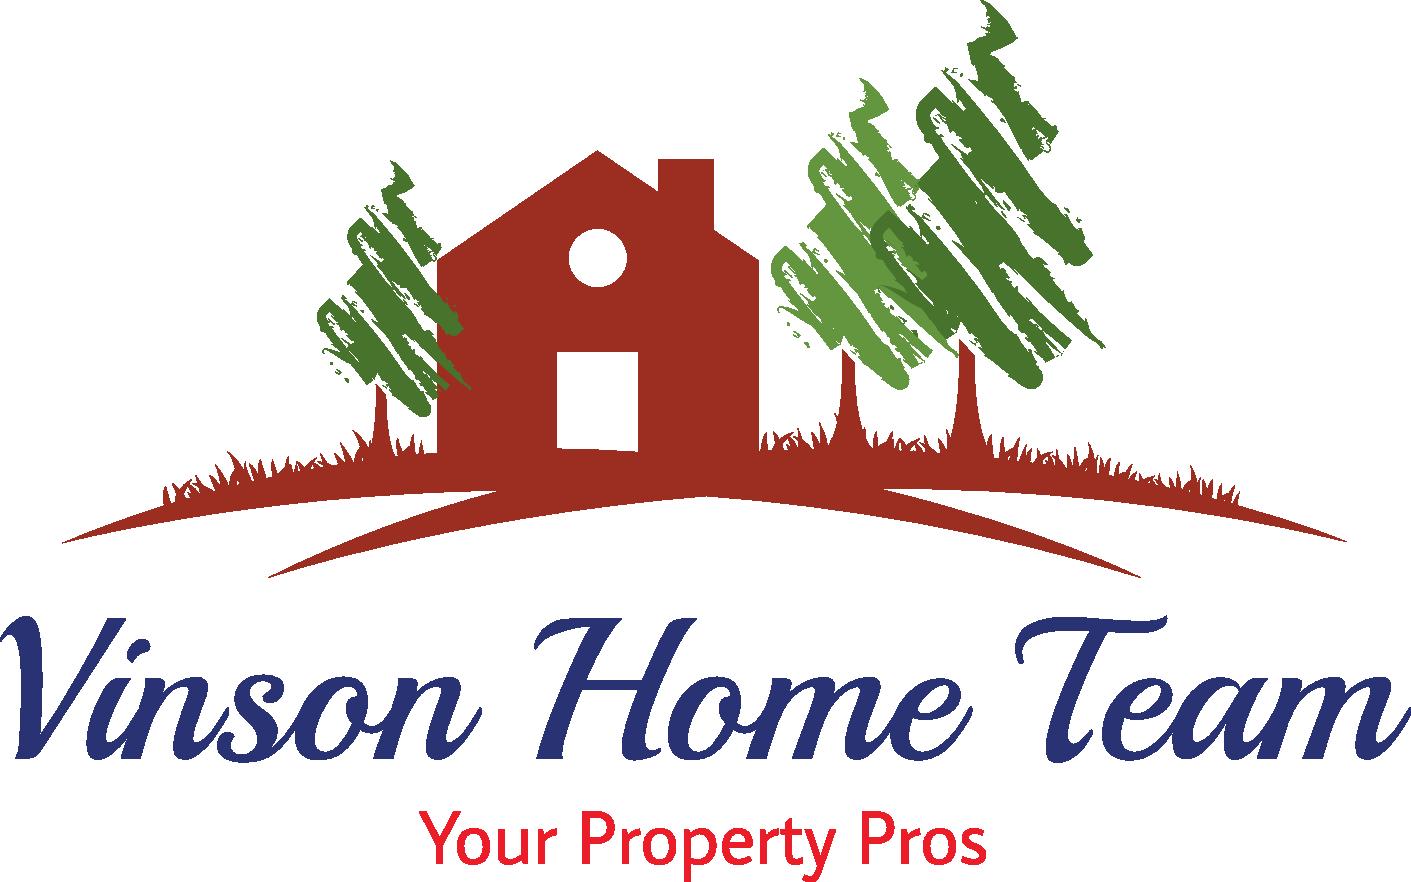 Vinson Home Team Danny Vinson